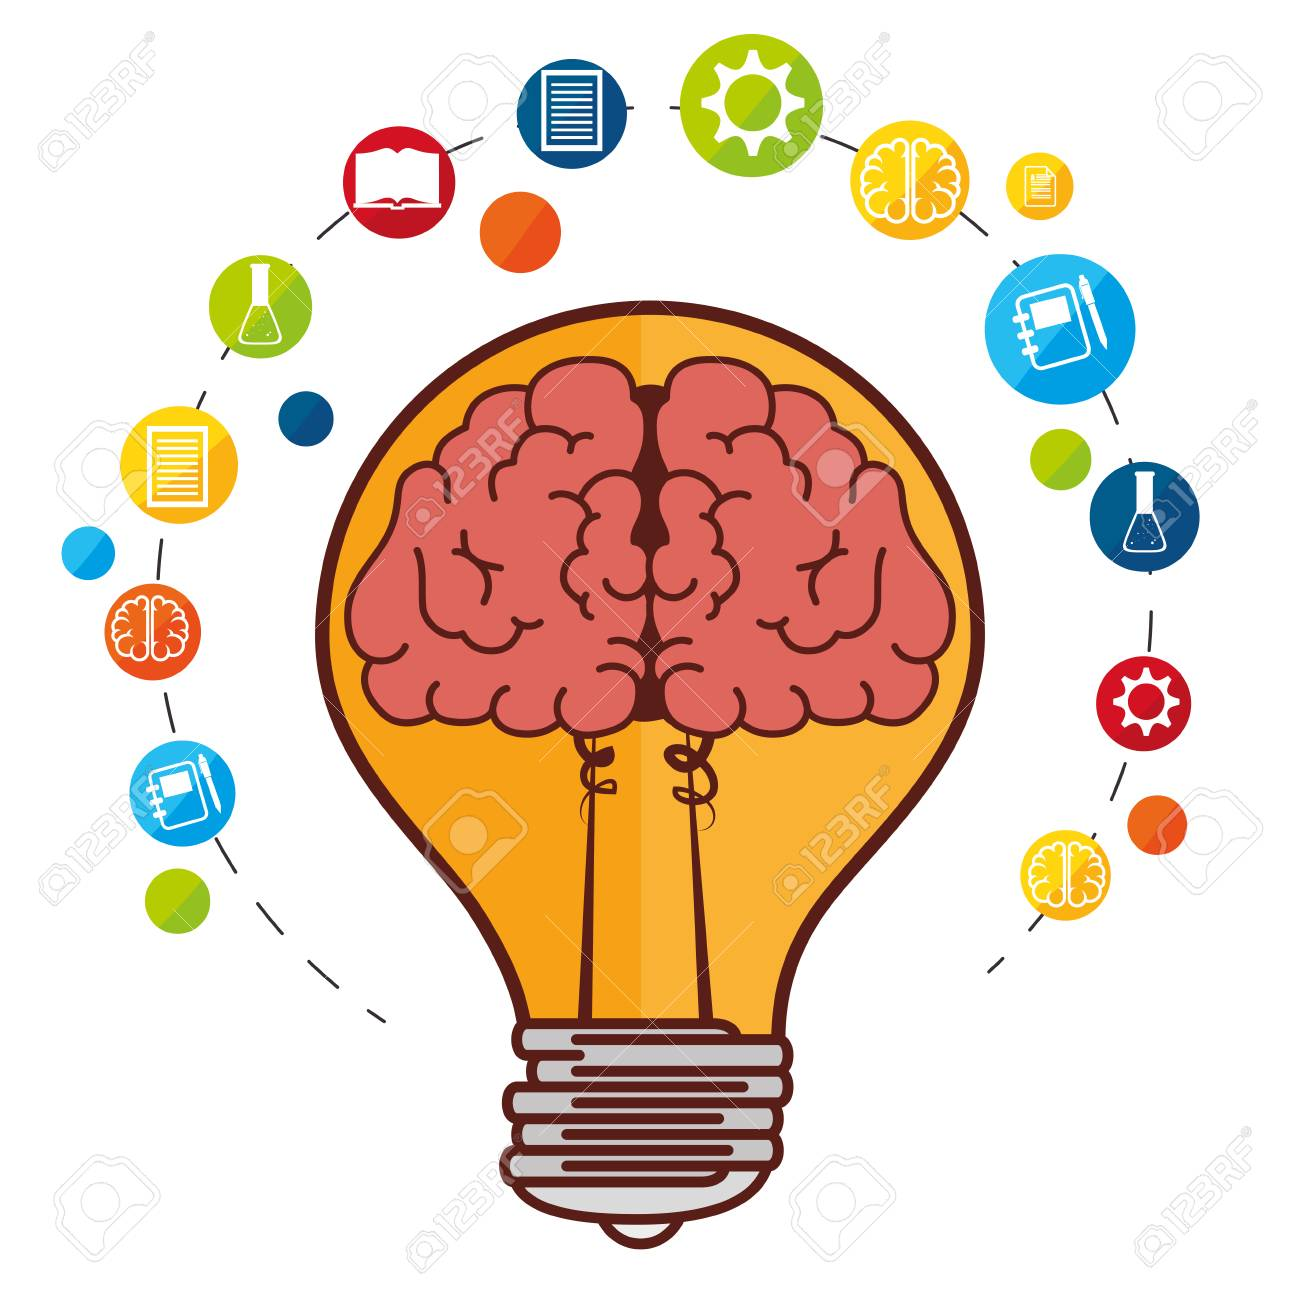 human brain creative ideas graphic design royalty free cliparts